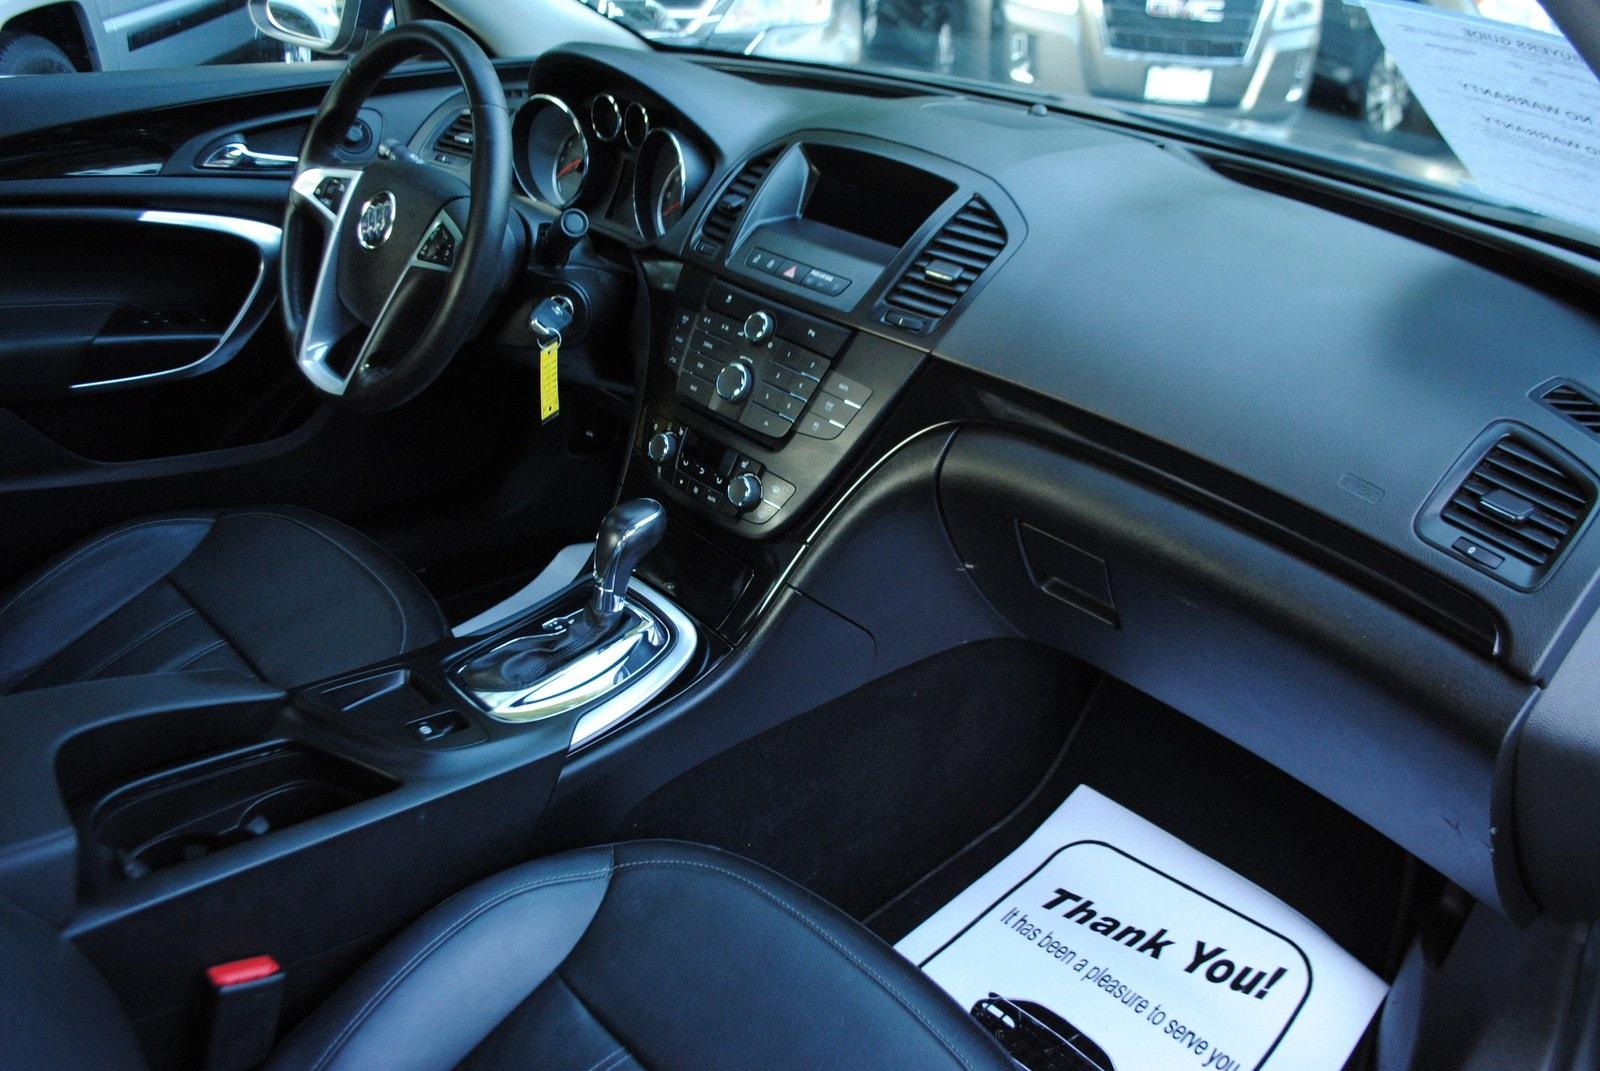 Buick Regal: Manual Mode